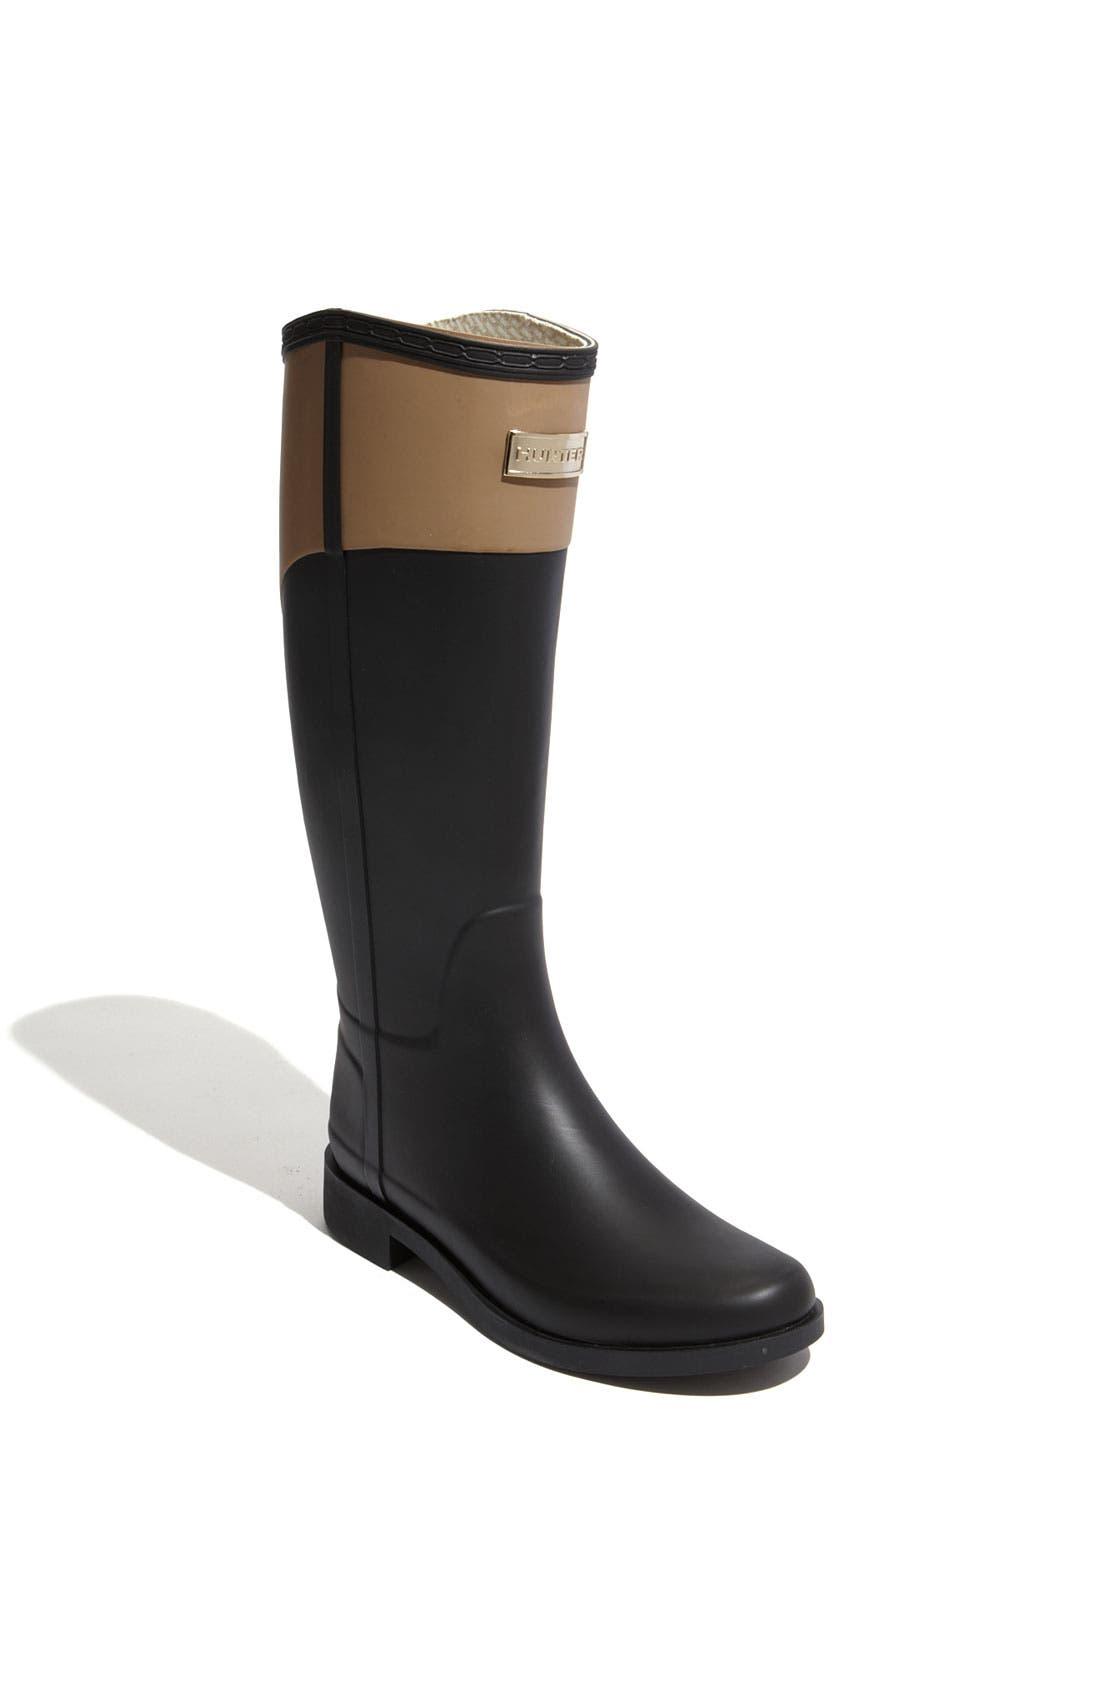 Alternate Image 1 Selected - Hunter 'Cece' Rain Boot (Women)